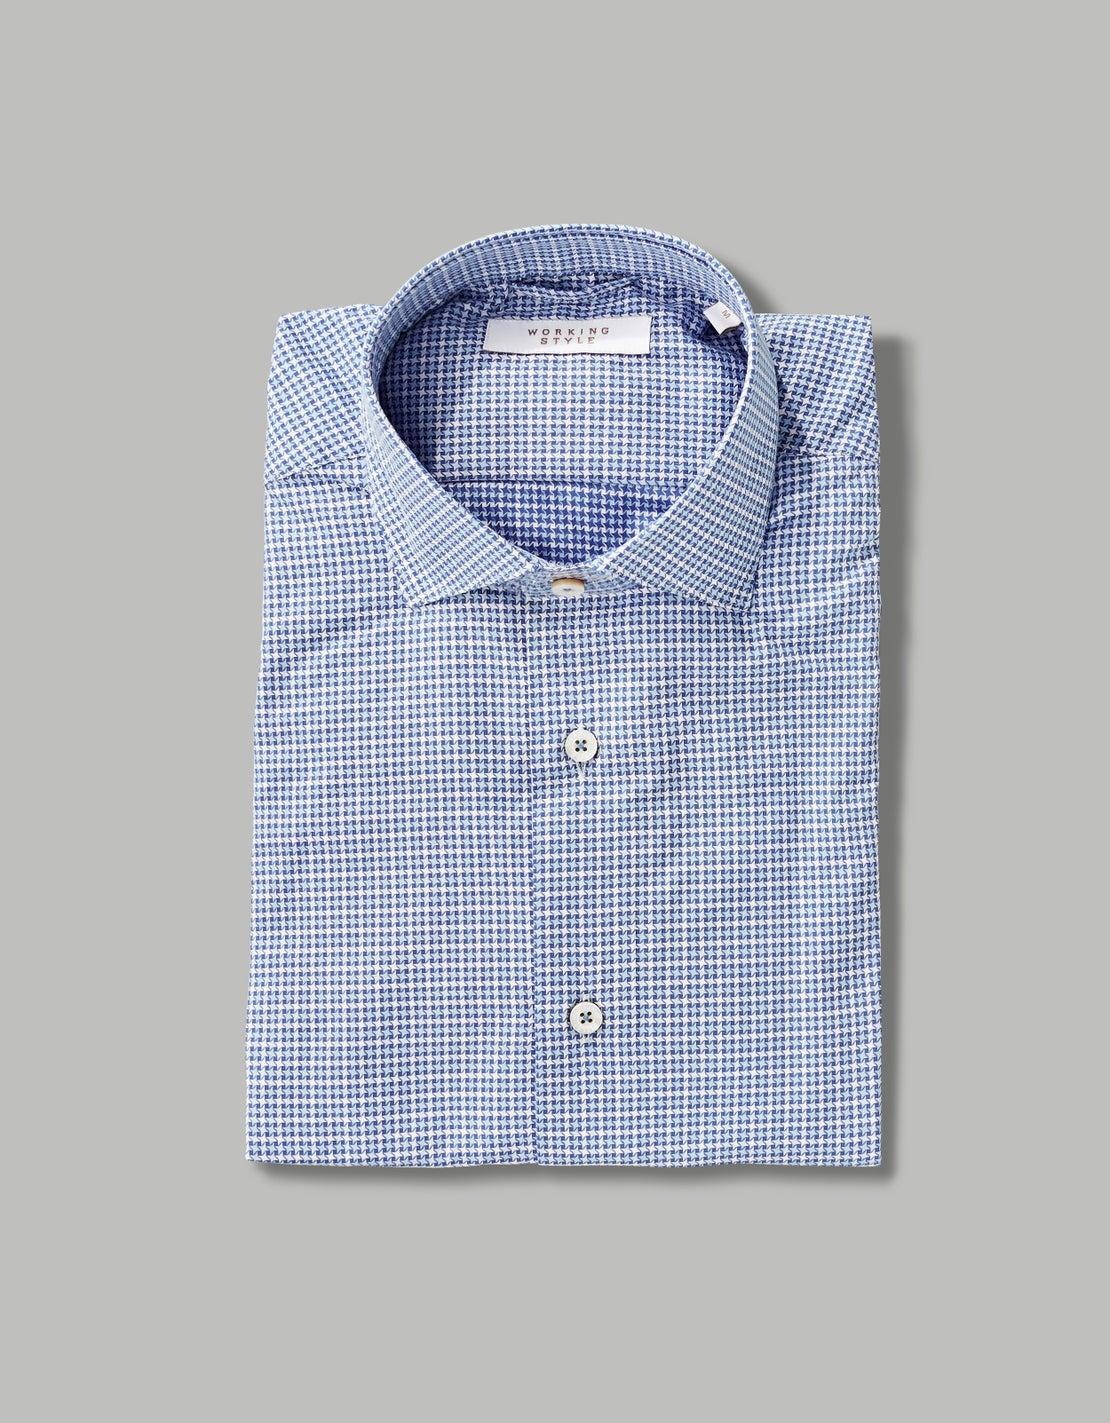 Blue Ninja Star Shirt